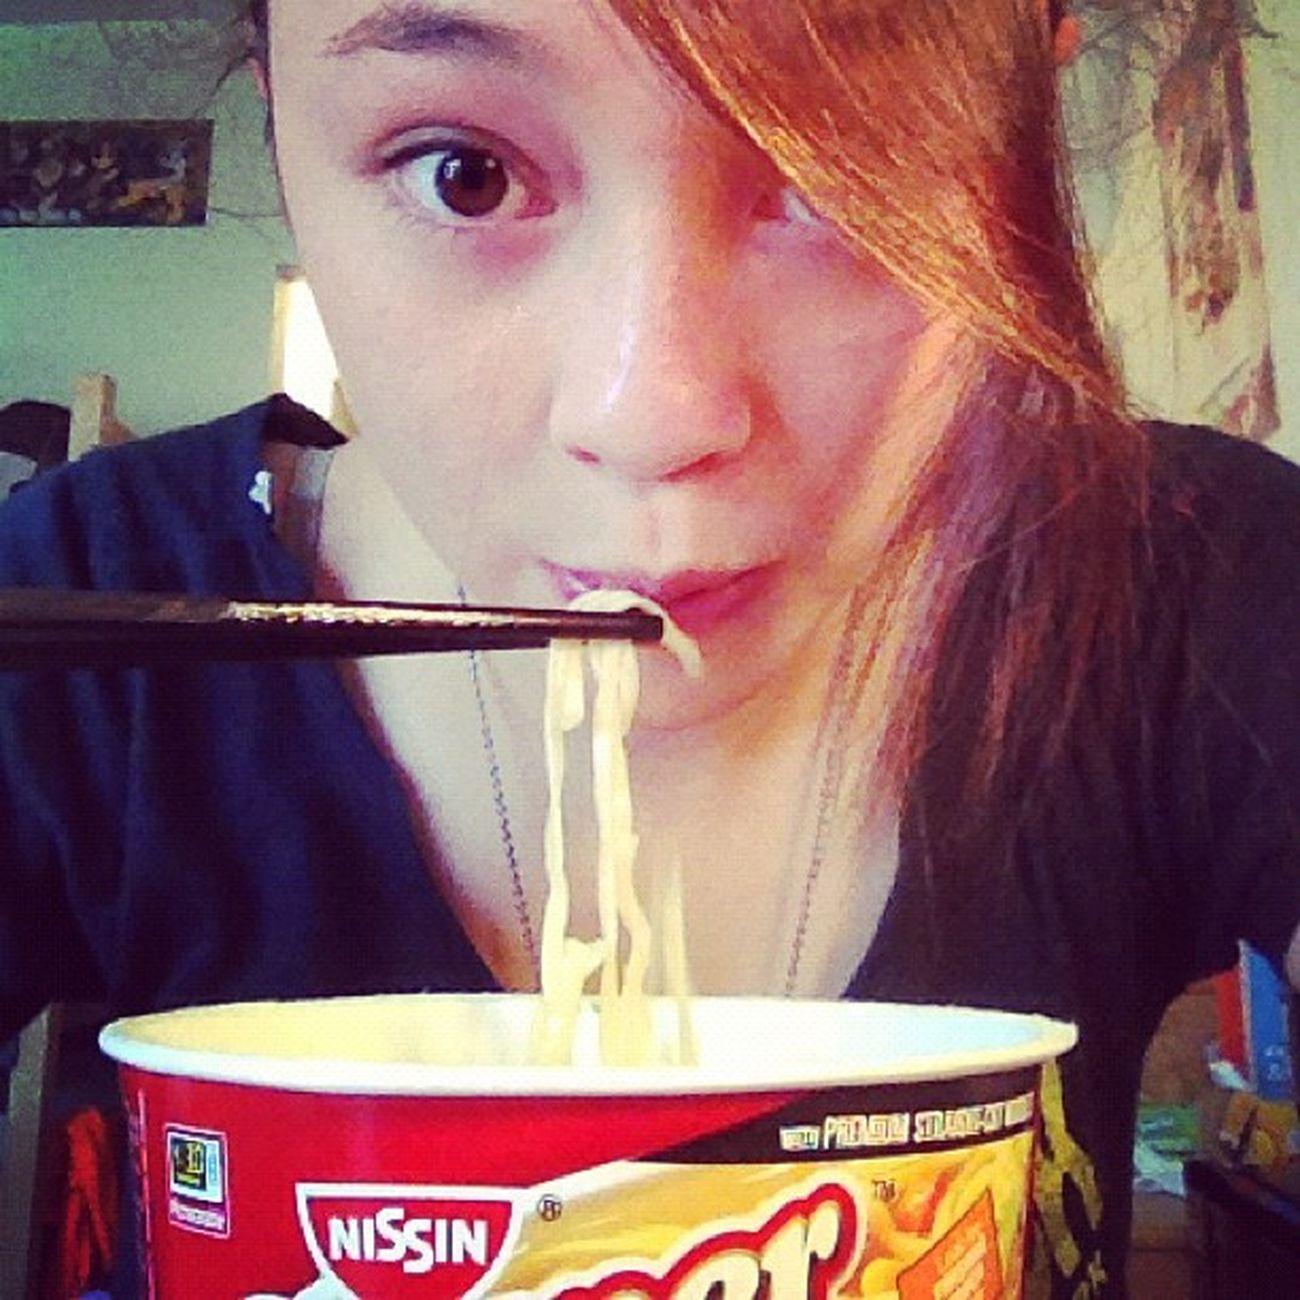 every fuckin day. Noodles Instant Souper Bowl ramen